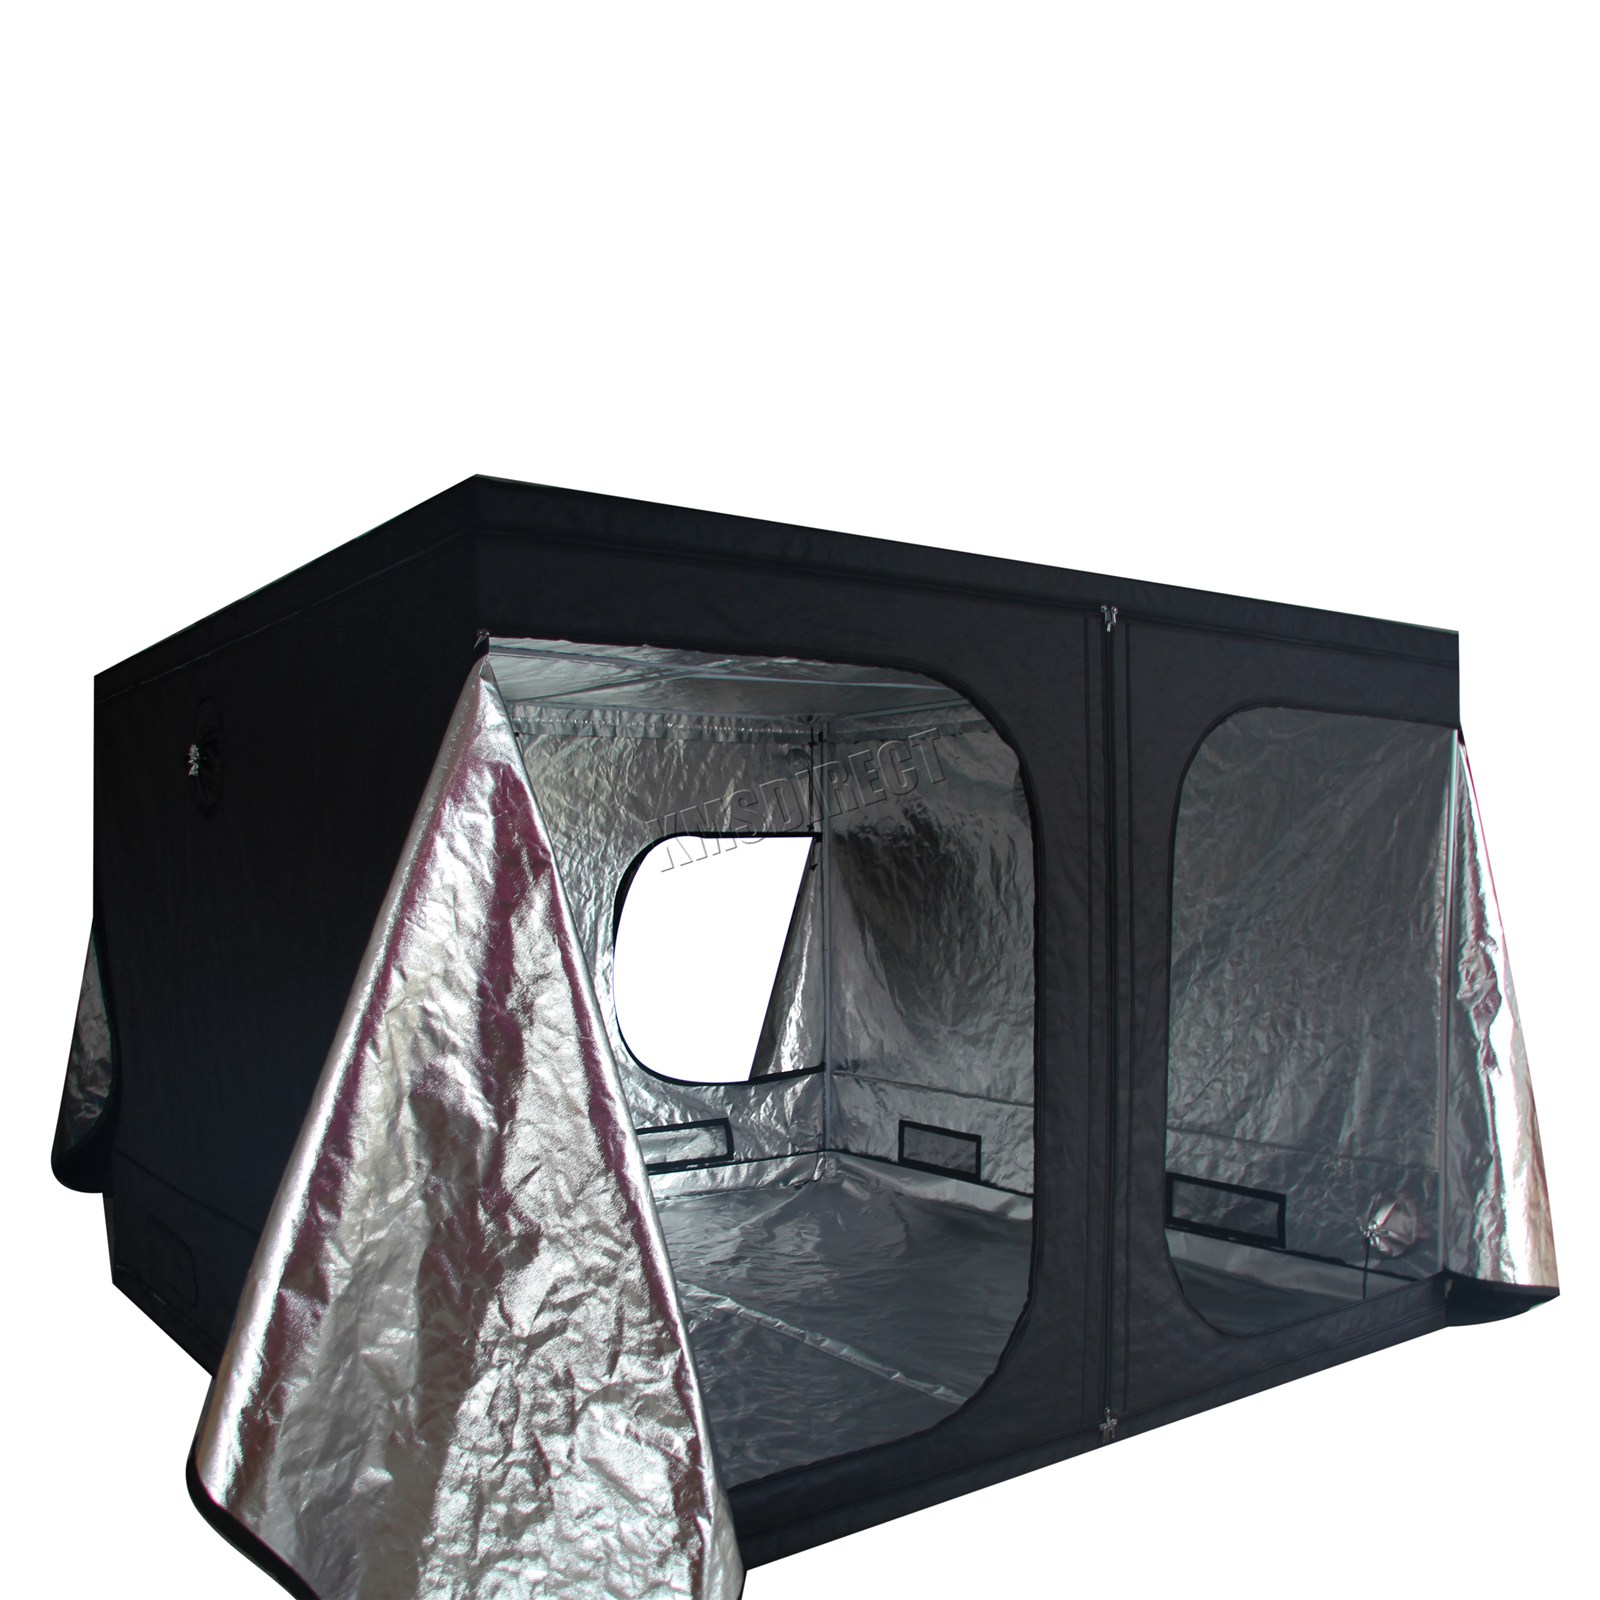 Indoor-Portable-Grow-Tent-Box-Silver-Mylar-Hydroponics-Bud-Green-Room-New-Design miniatuur 24